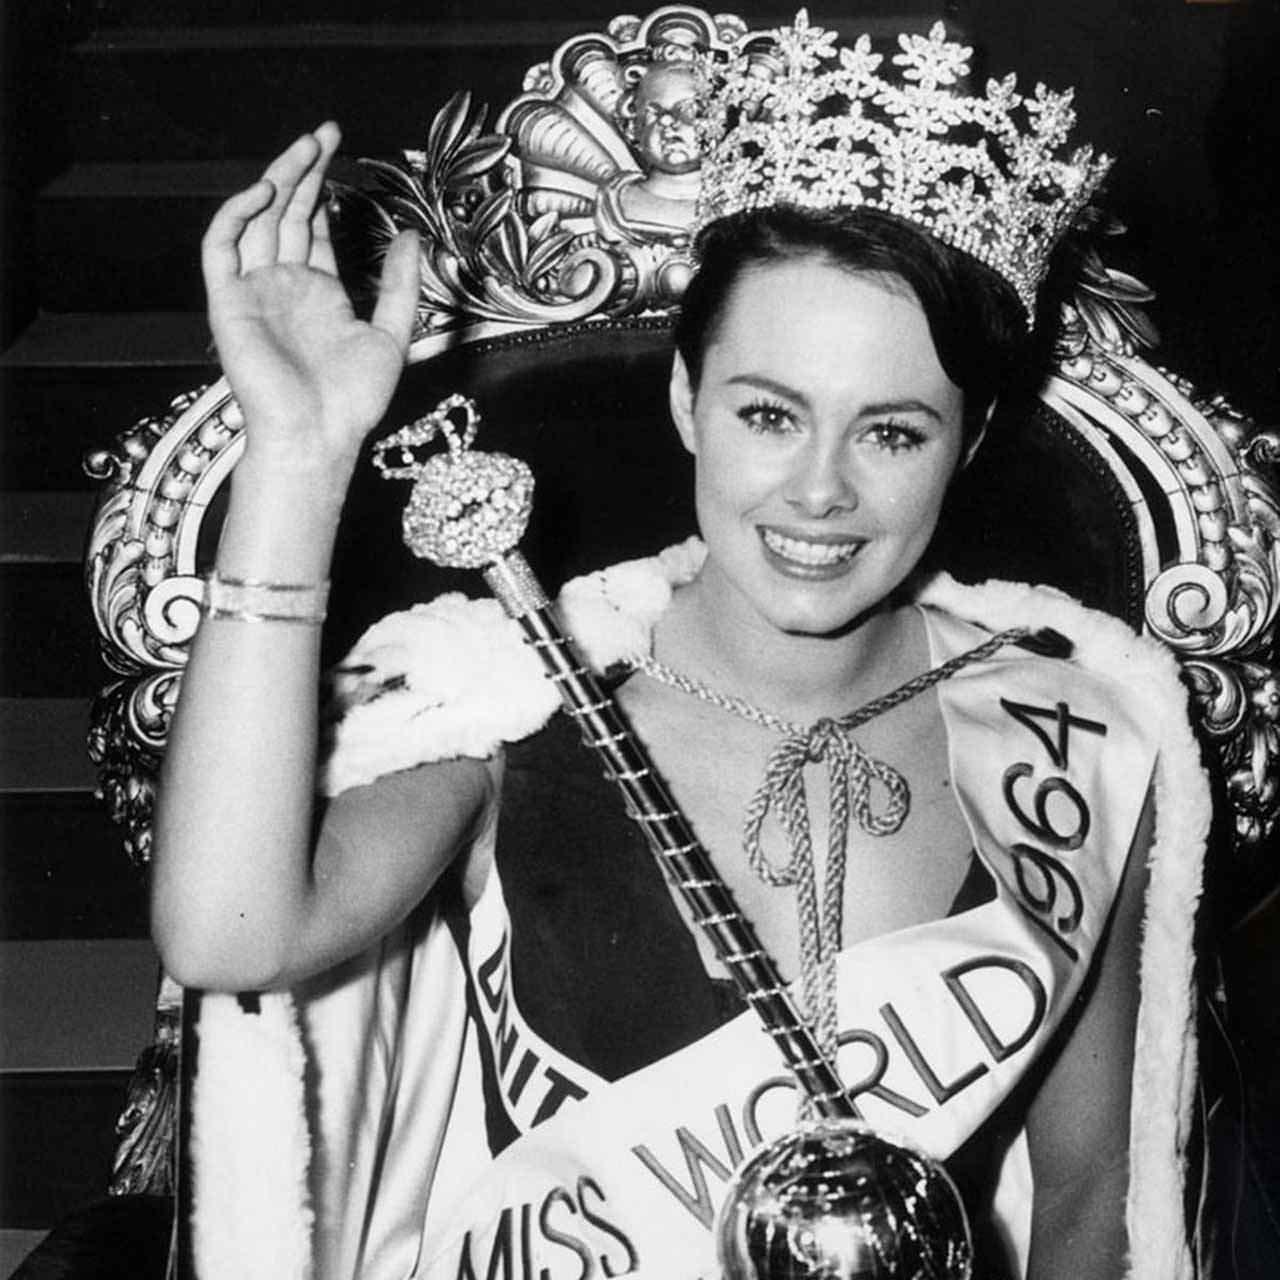 Фото | Мисс Мира 1964 года Энн Сидни